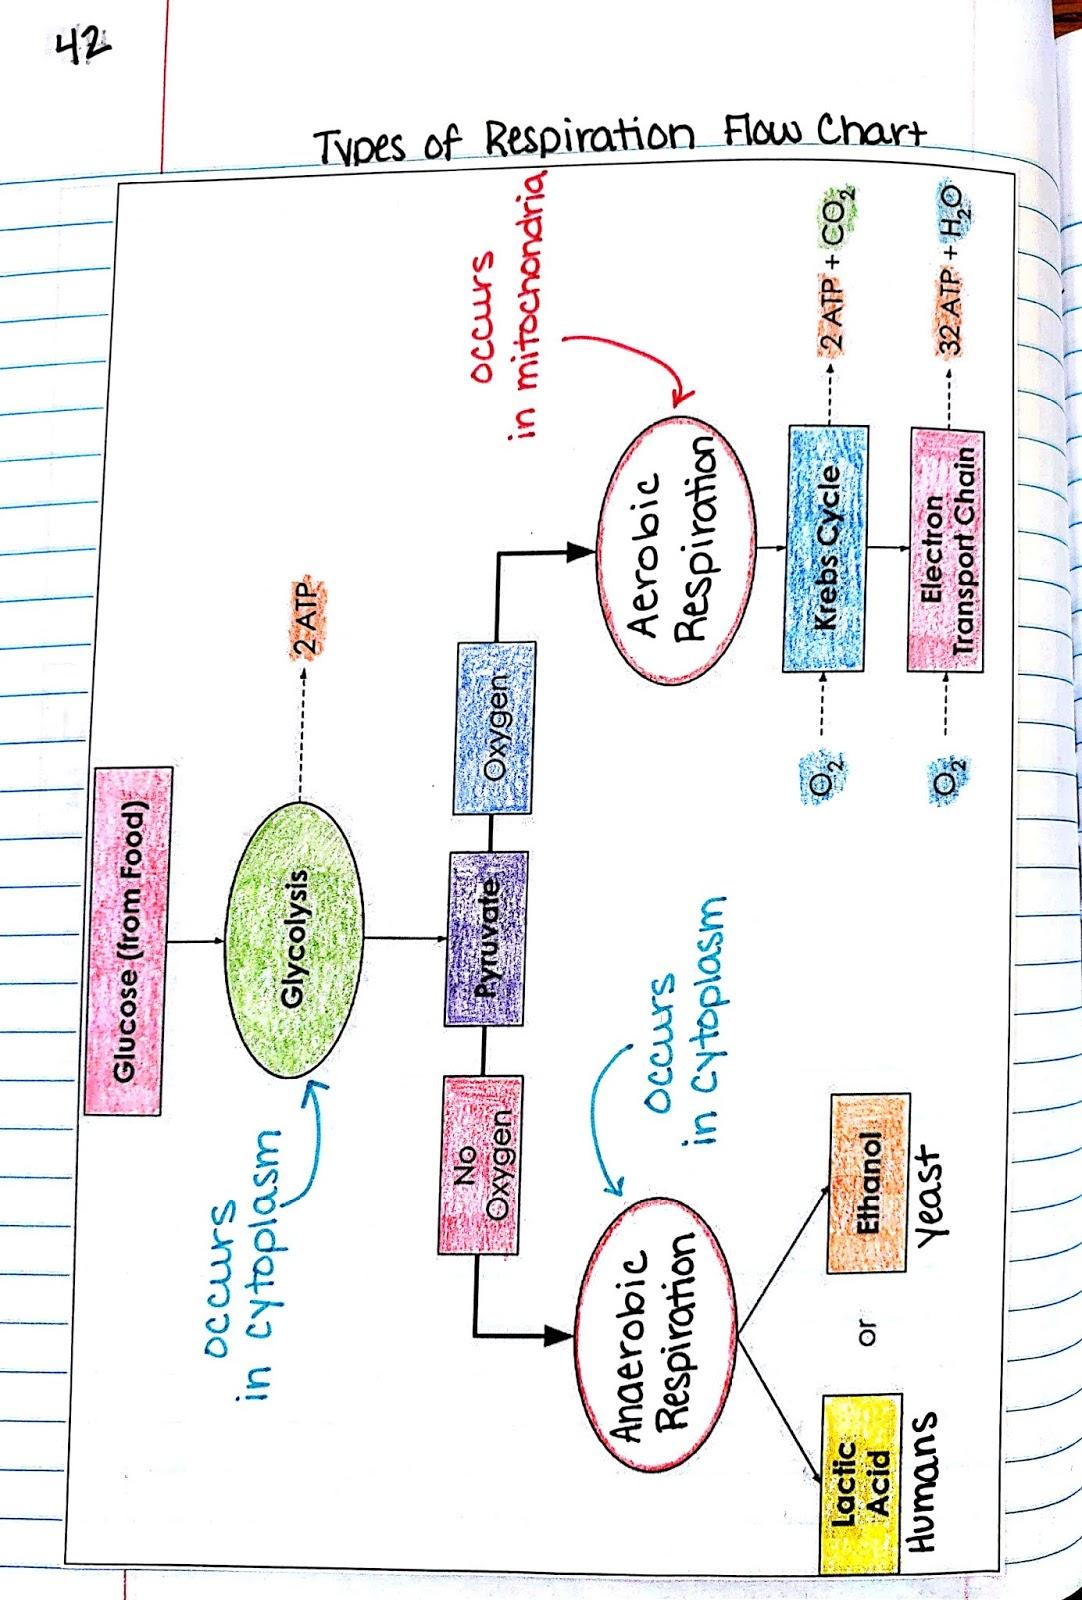 I Teach Science And Sample Inb Unit For Biology